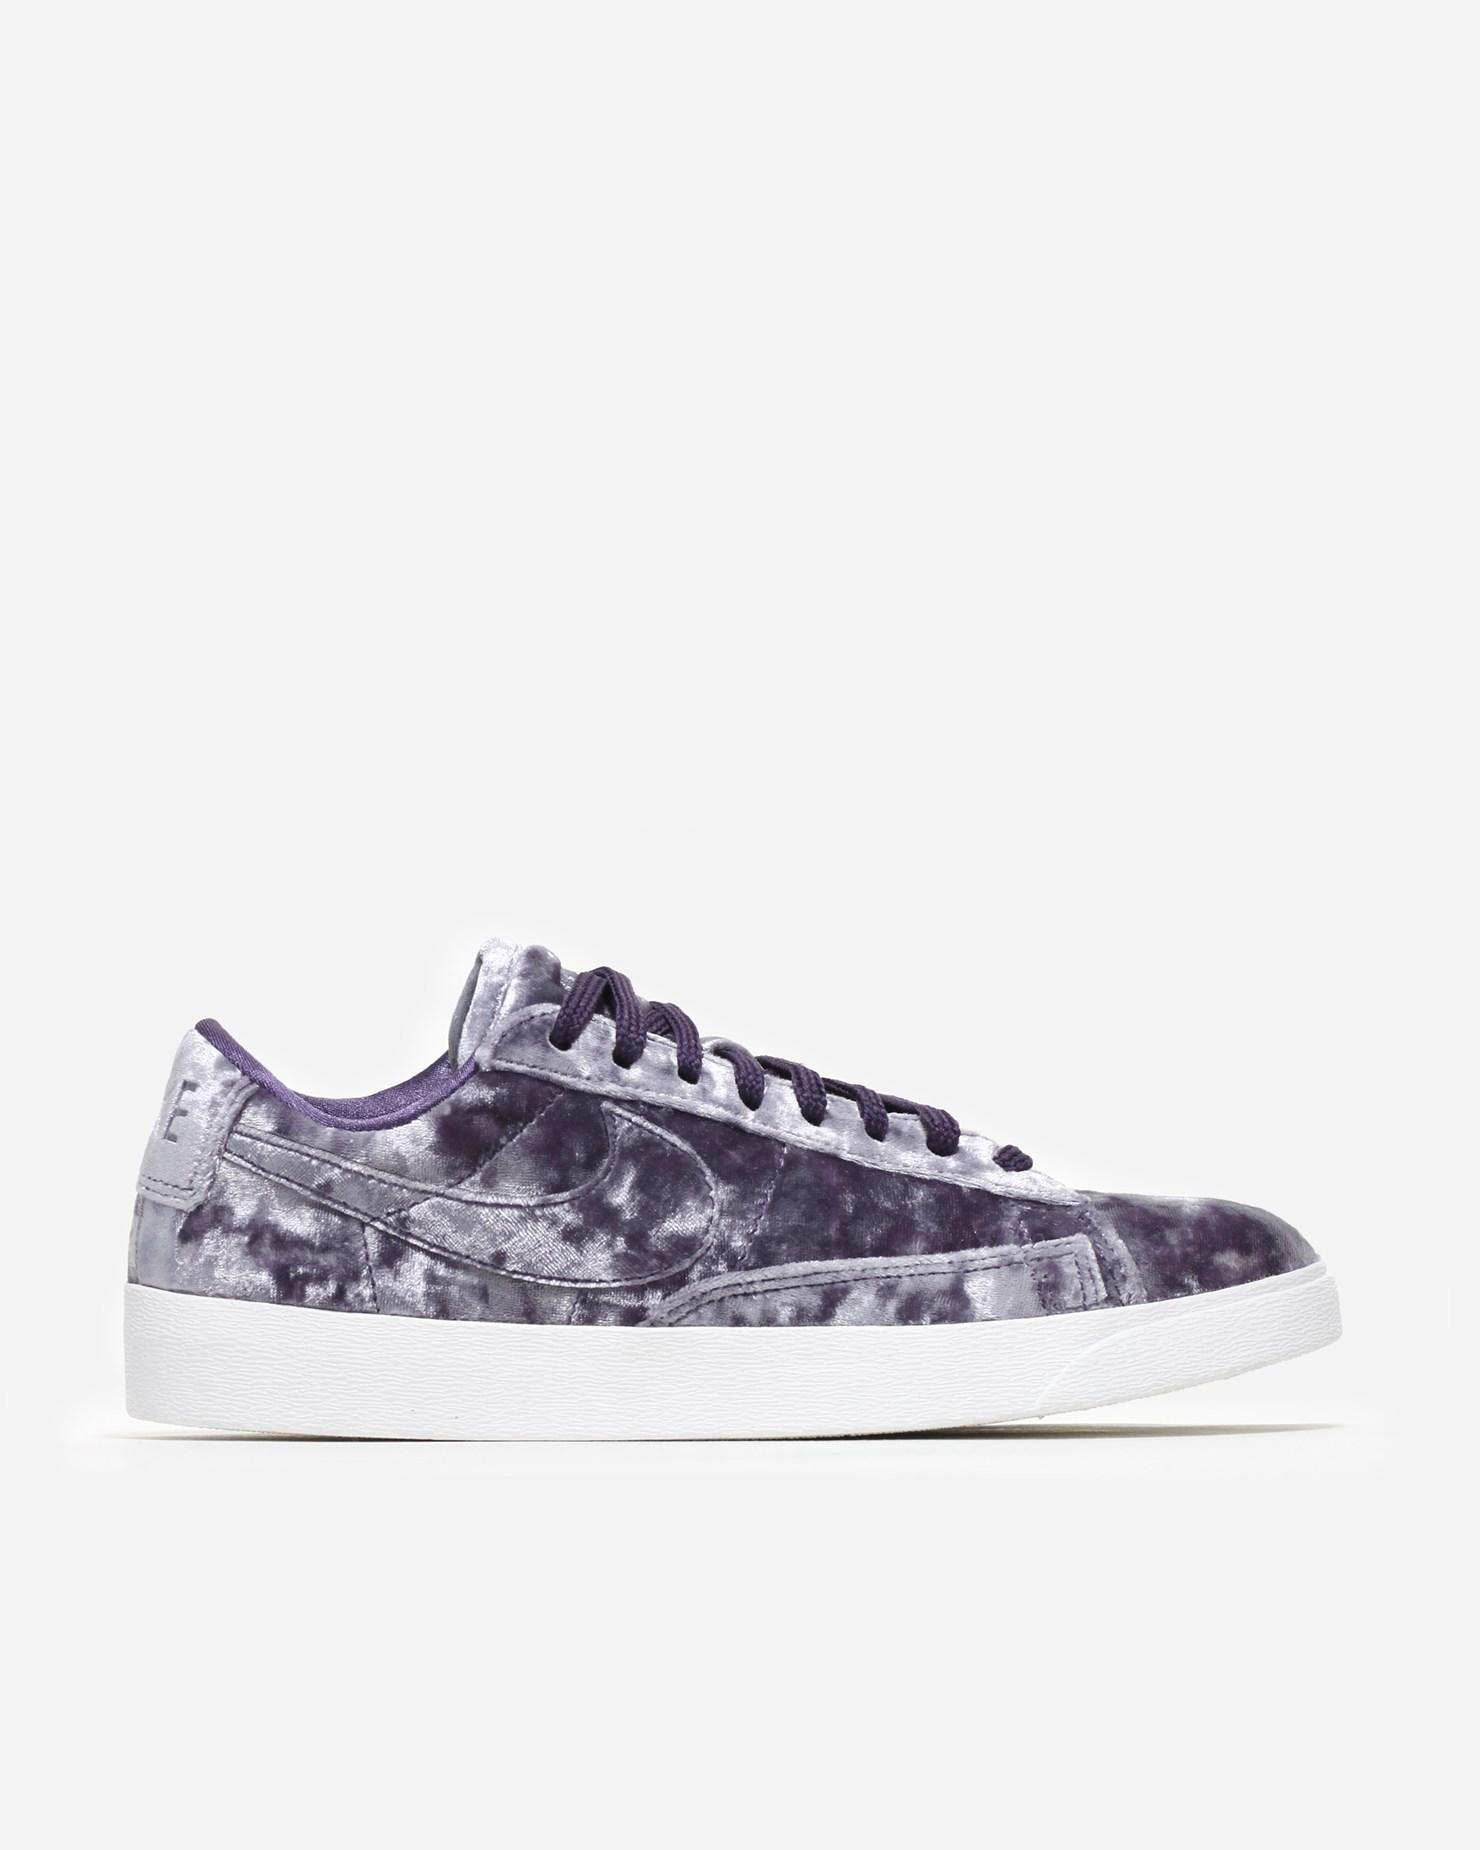 Nike Sportswear Blazer Low LX AA2017 500   Dark Raisin